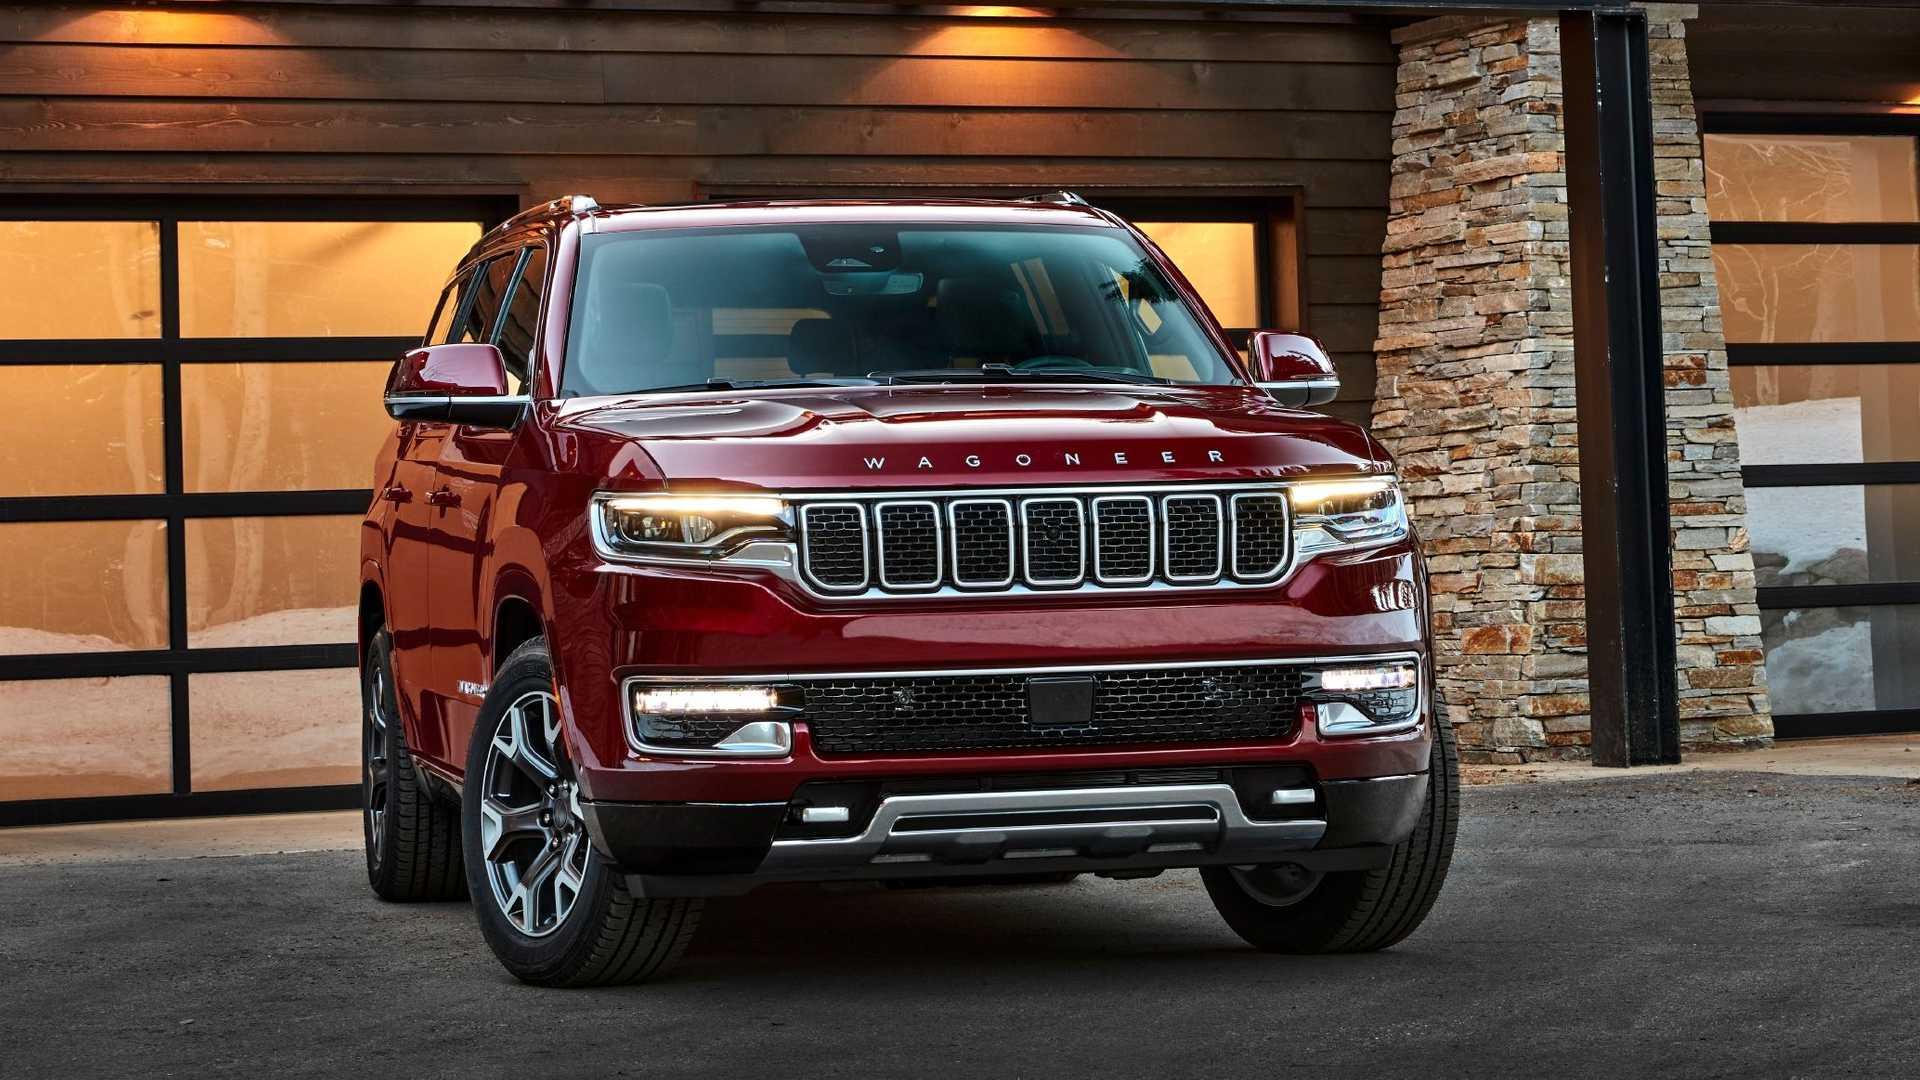 2022-jeep-wagoneer-exterior-front-quarter-2